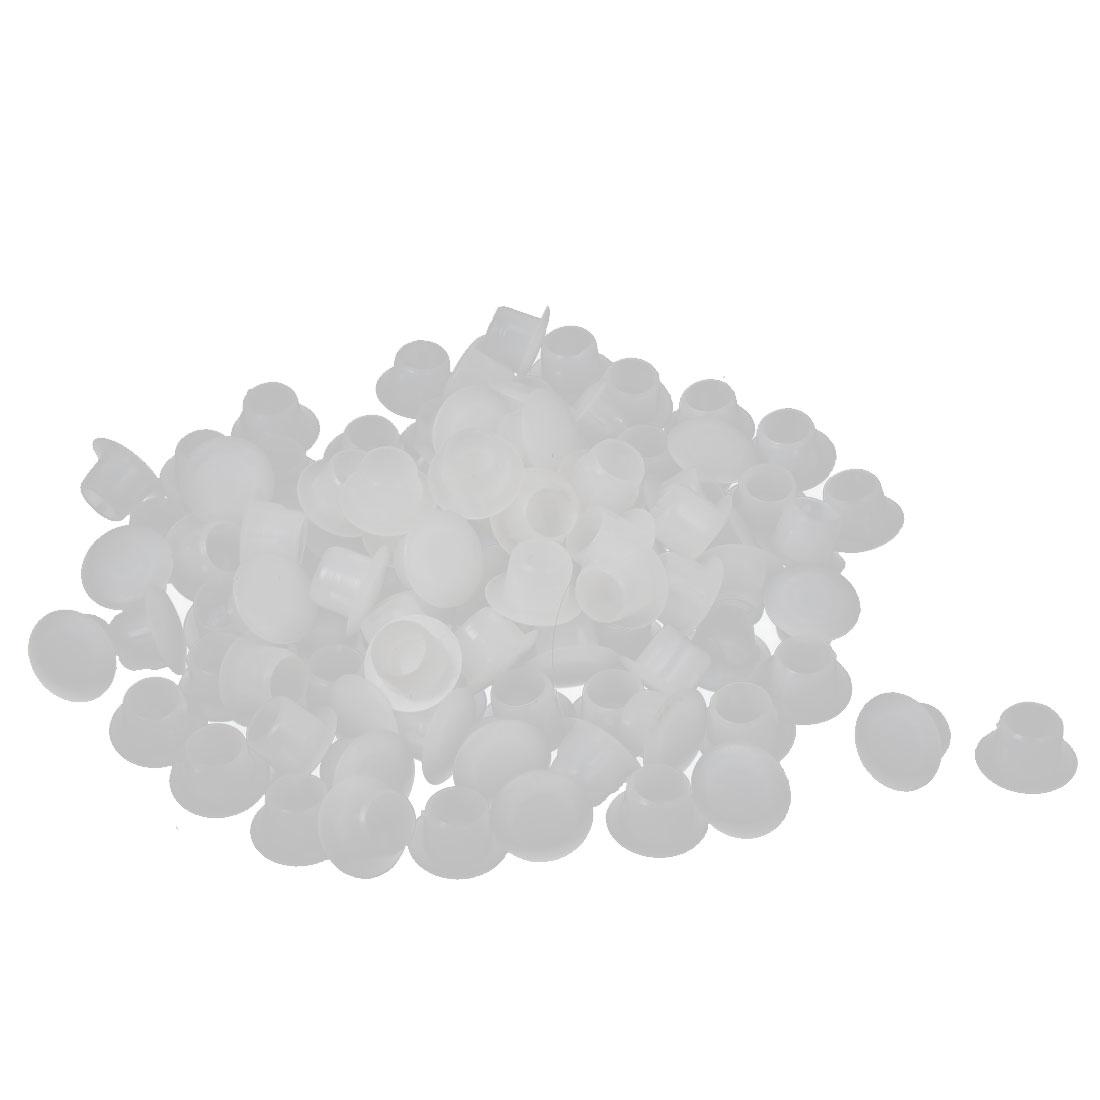 8mm Diameter Hole Plastic Round Shaped Furniture Screw Cap Covers White 100 Pcs